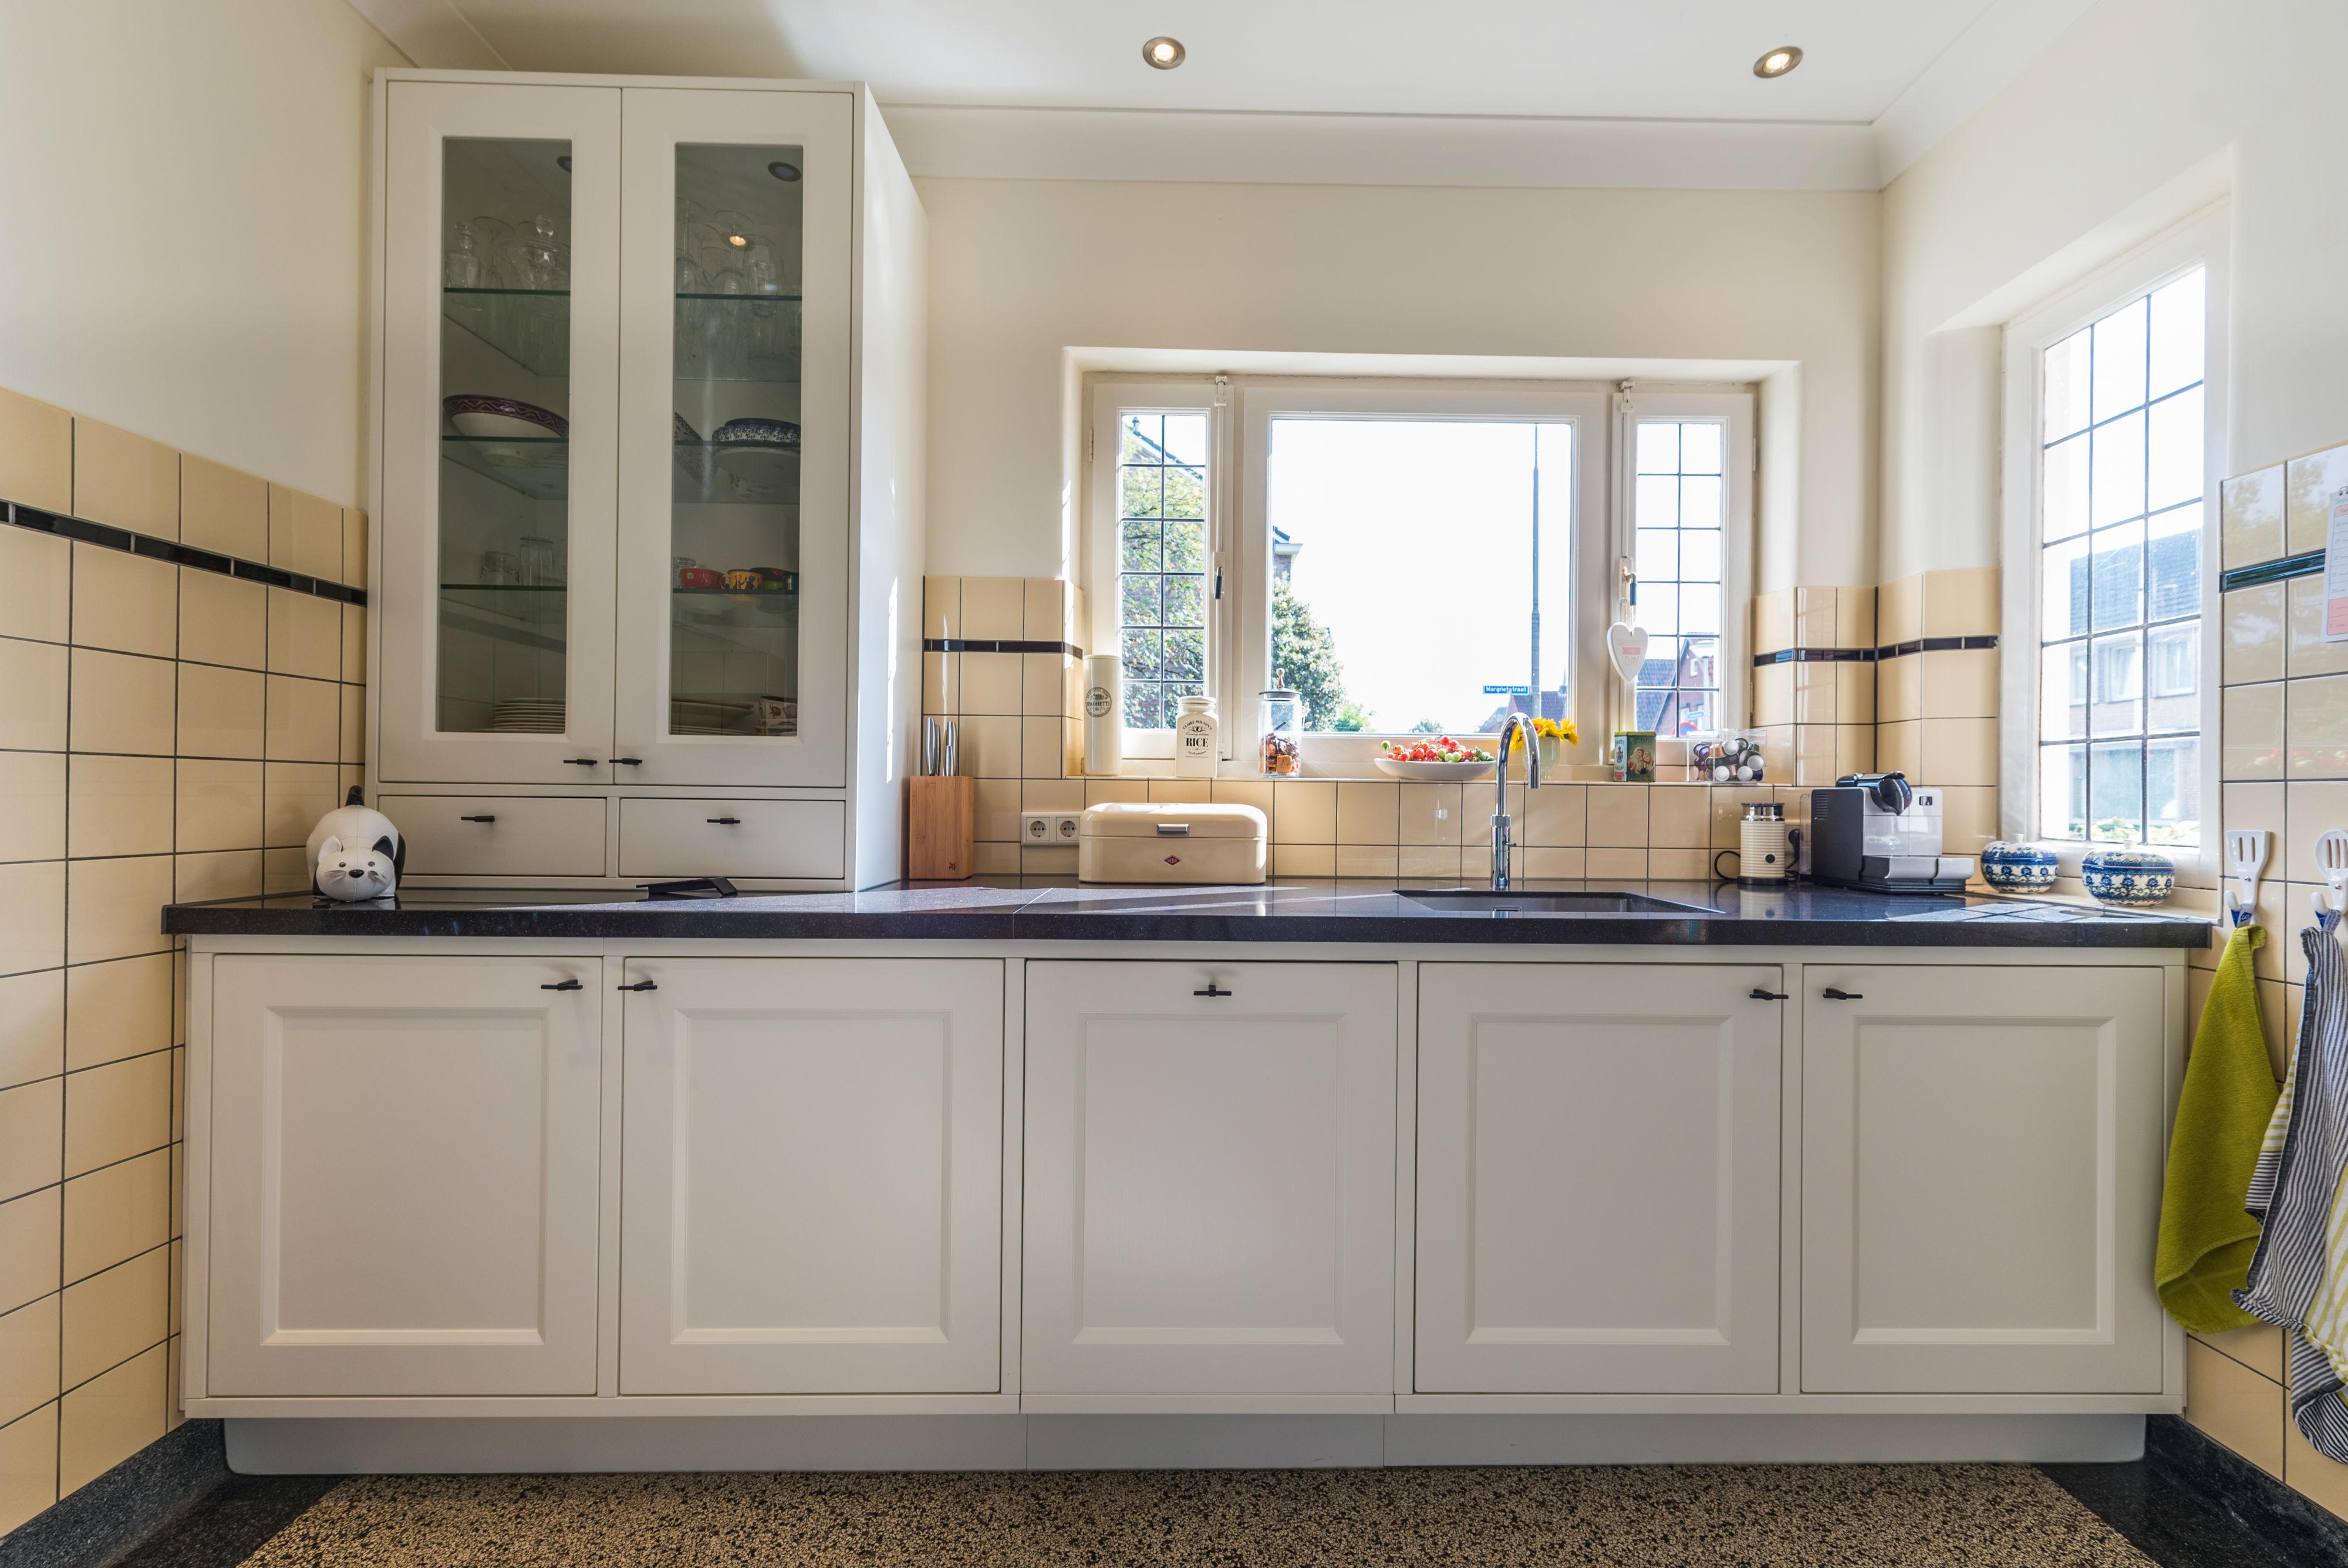 Keuken En Badkamer : Keuken badkamer mierlo jamo restiau